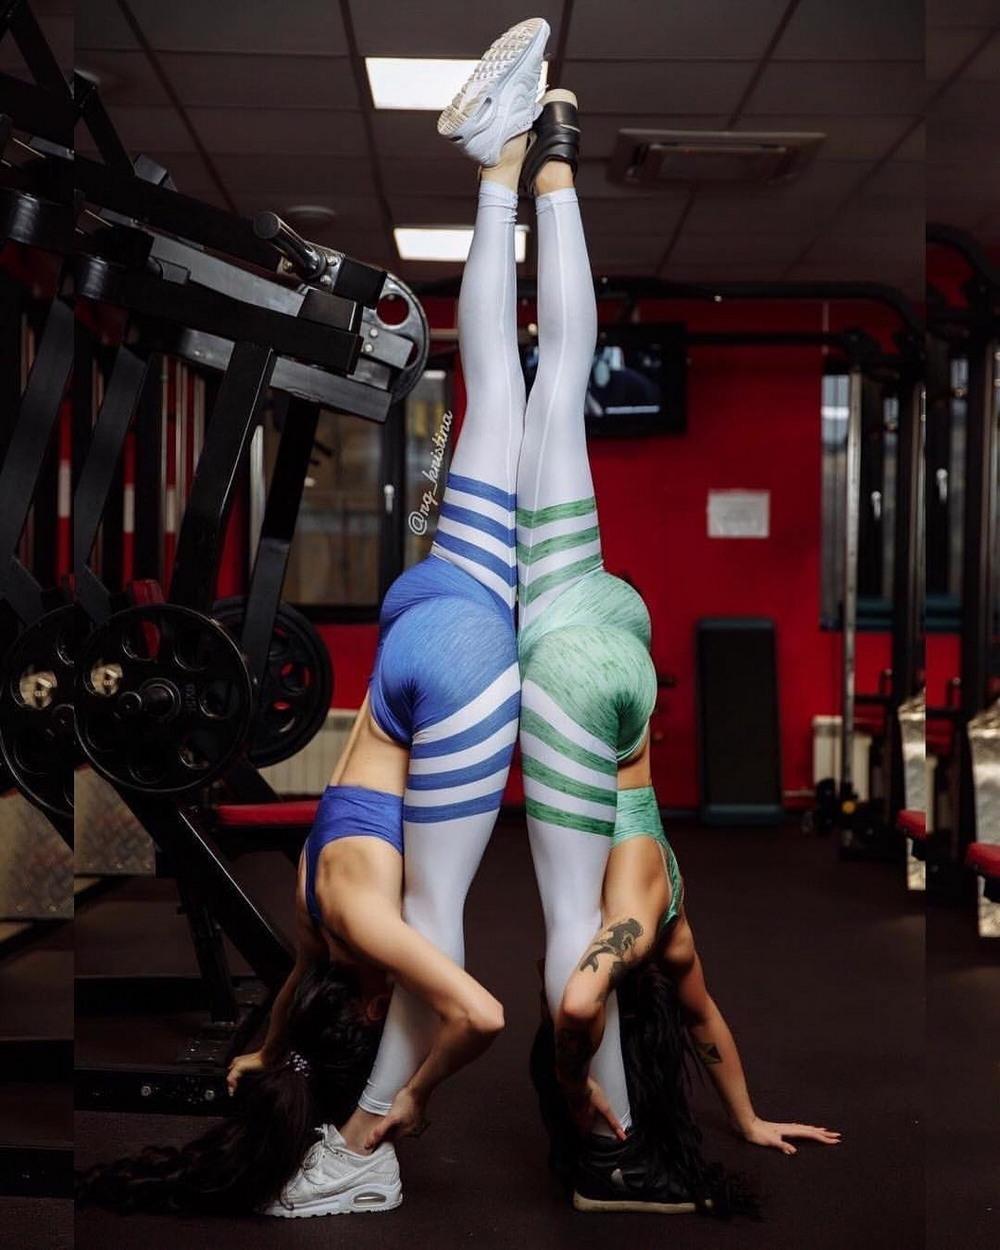 gym butts.jpg